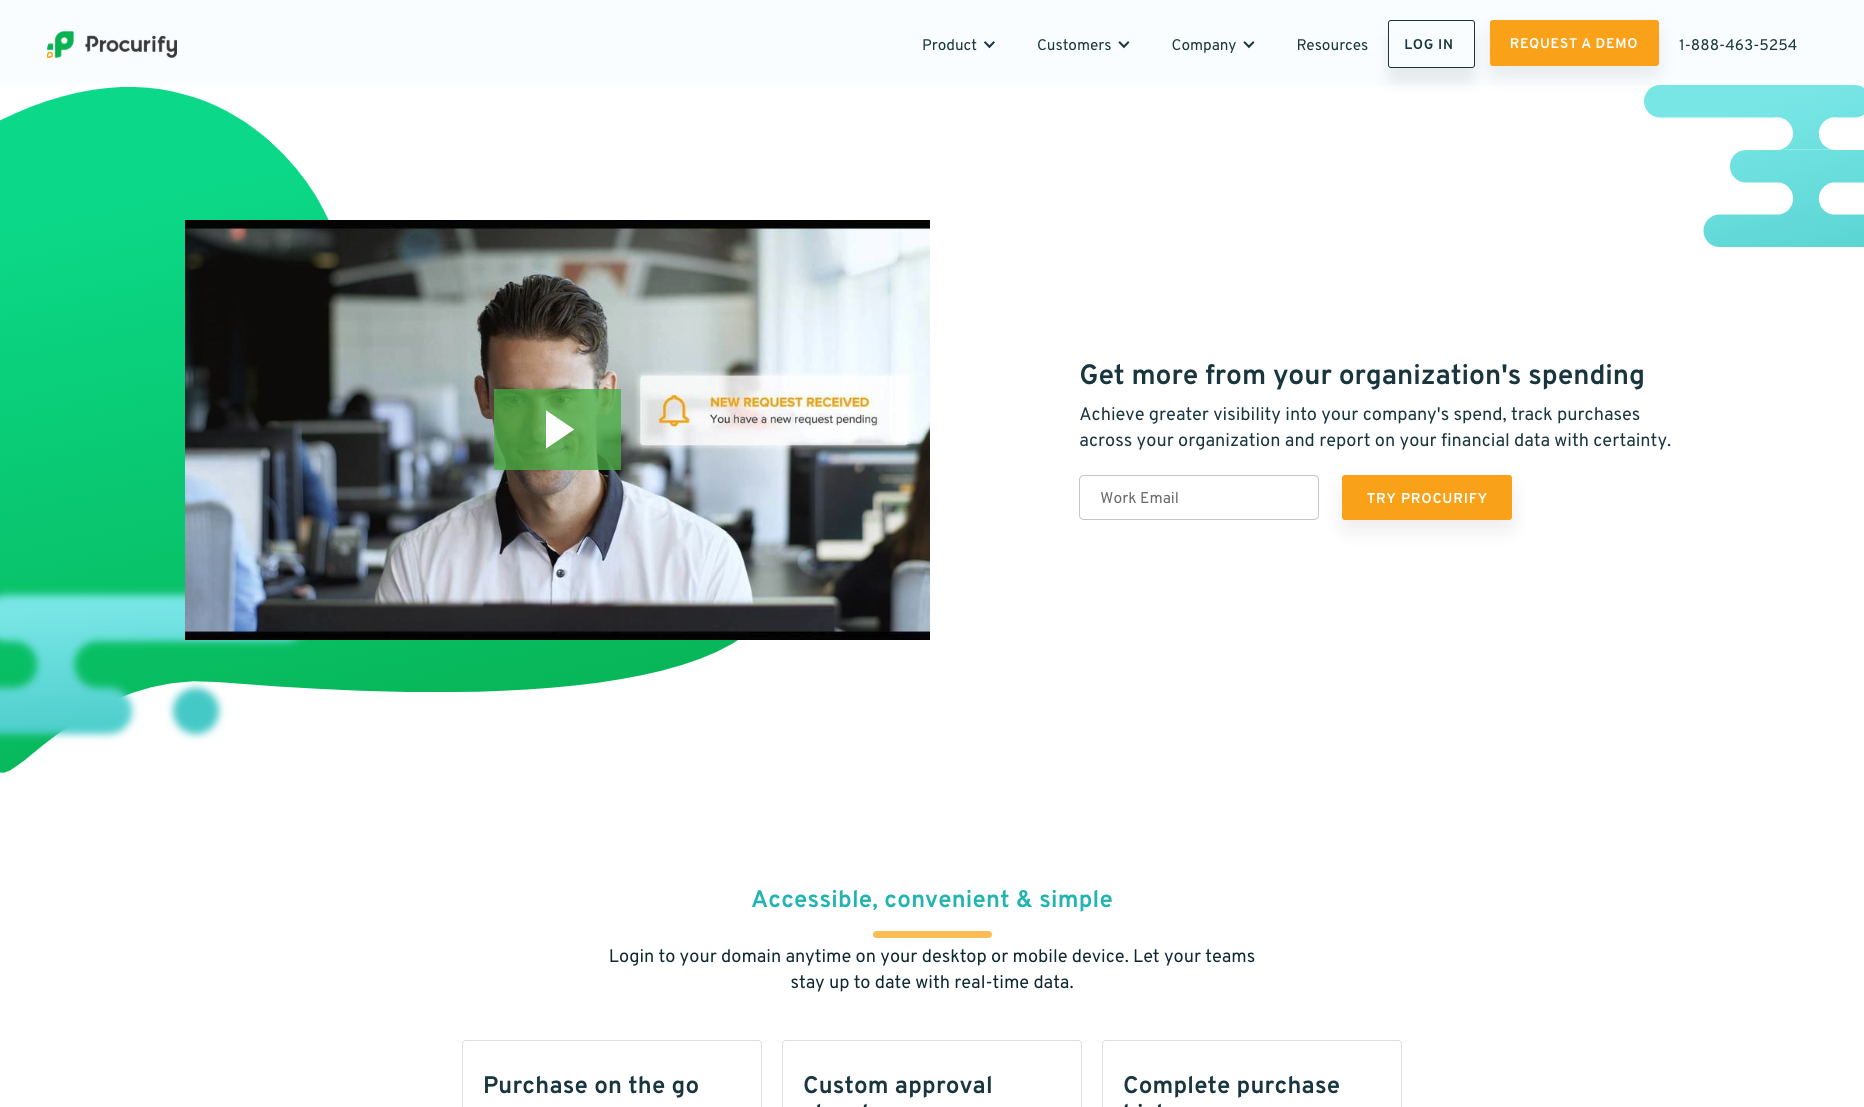 Procurify's homepage